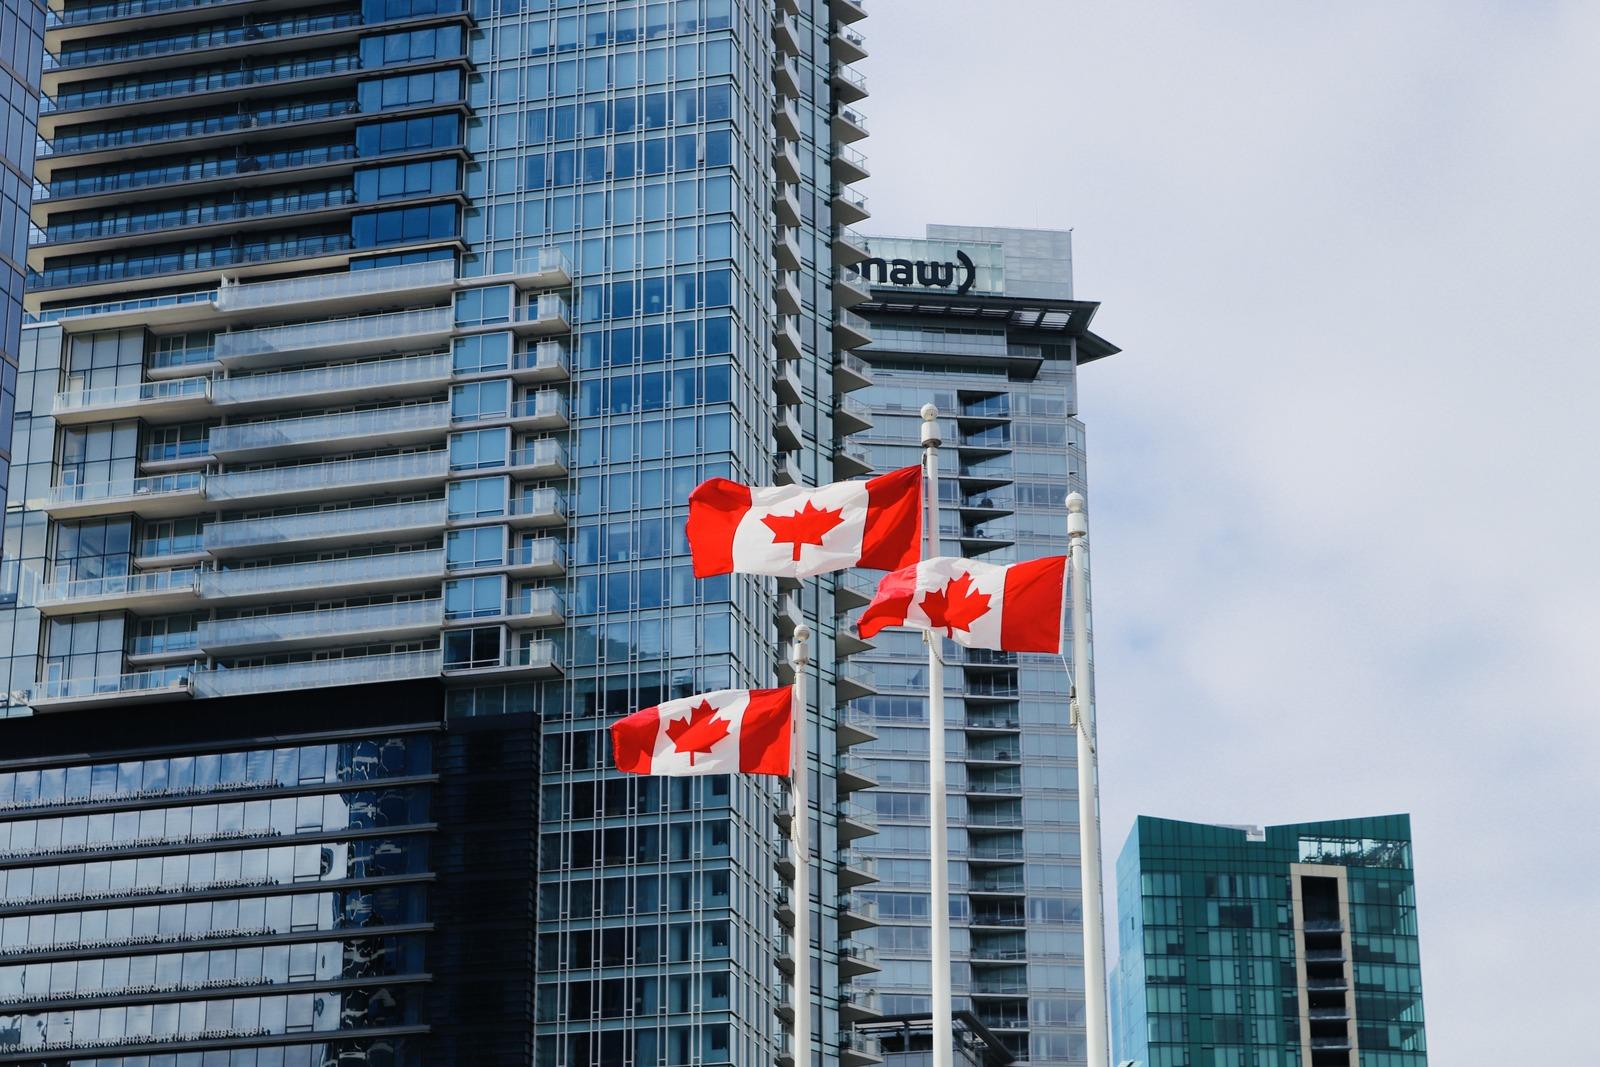 Kanada Flaggen in Vancouver